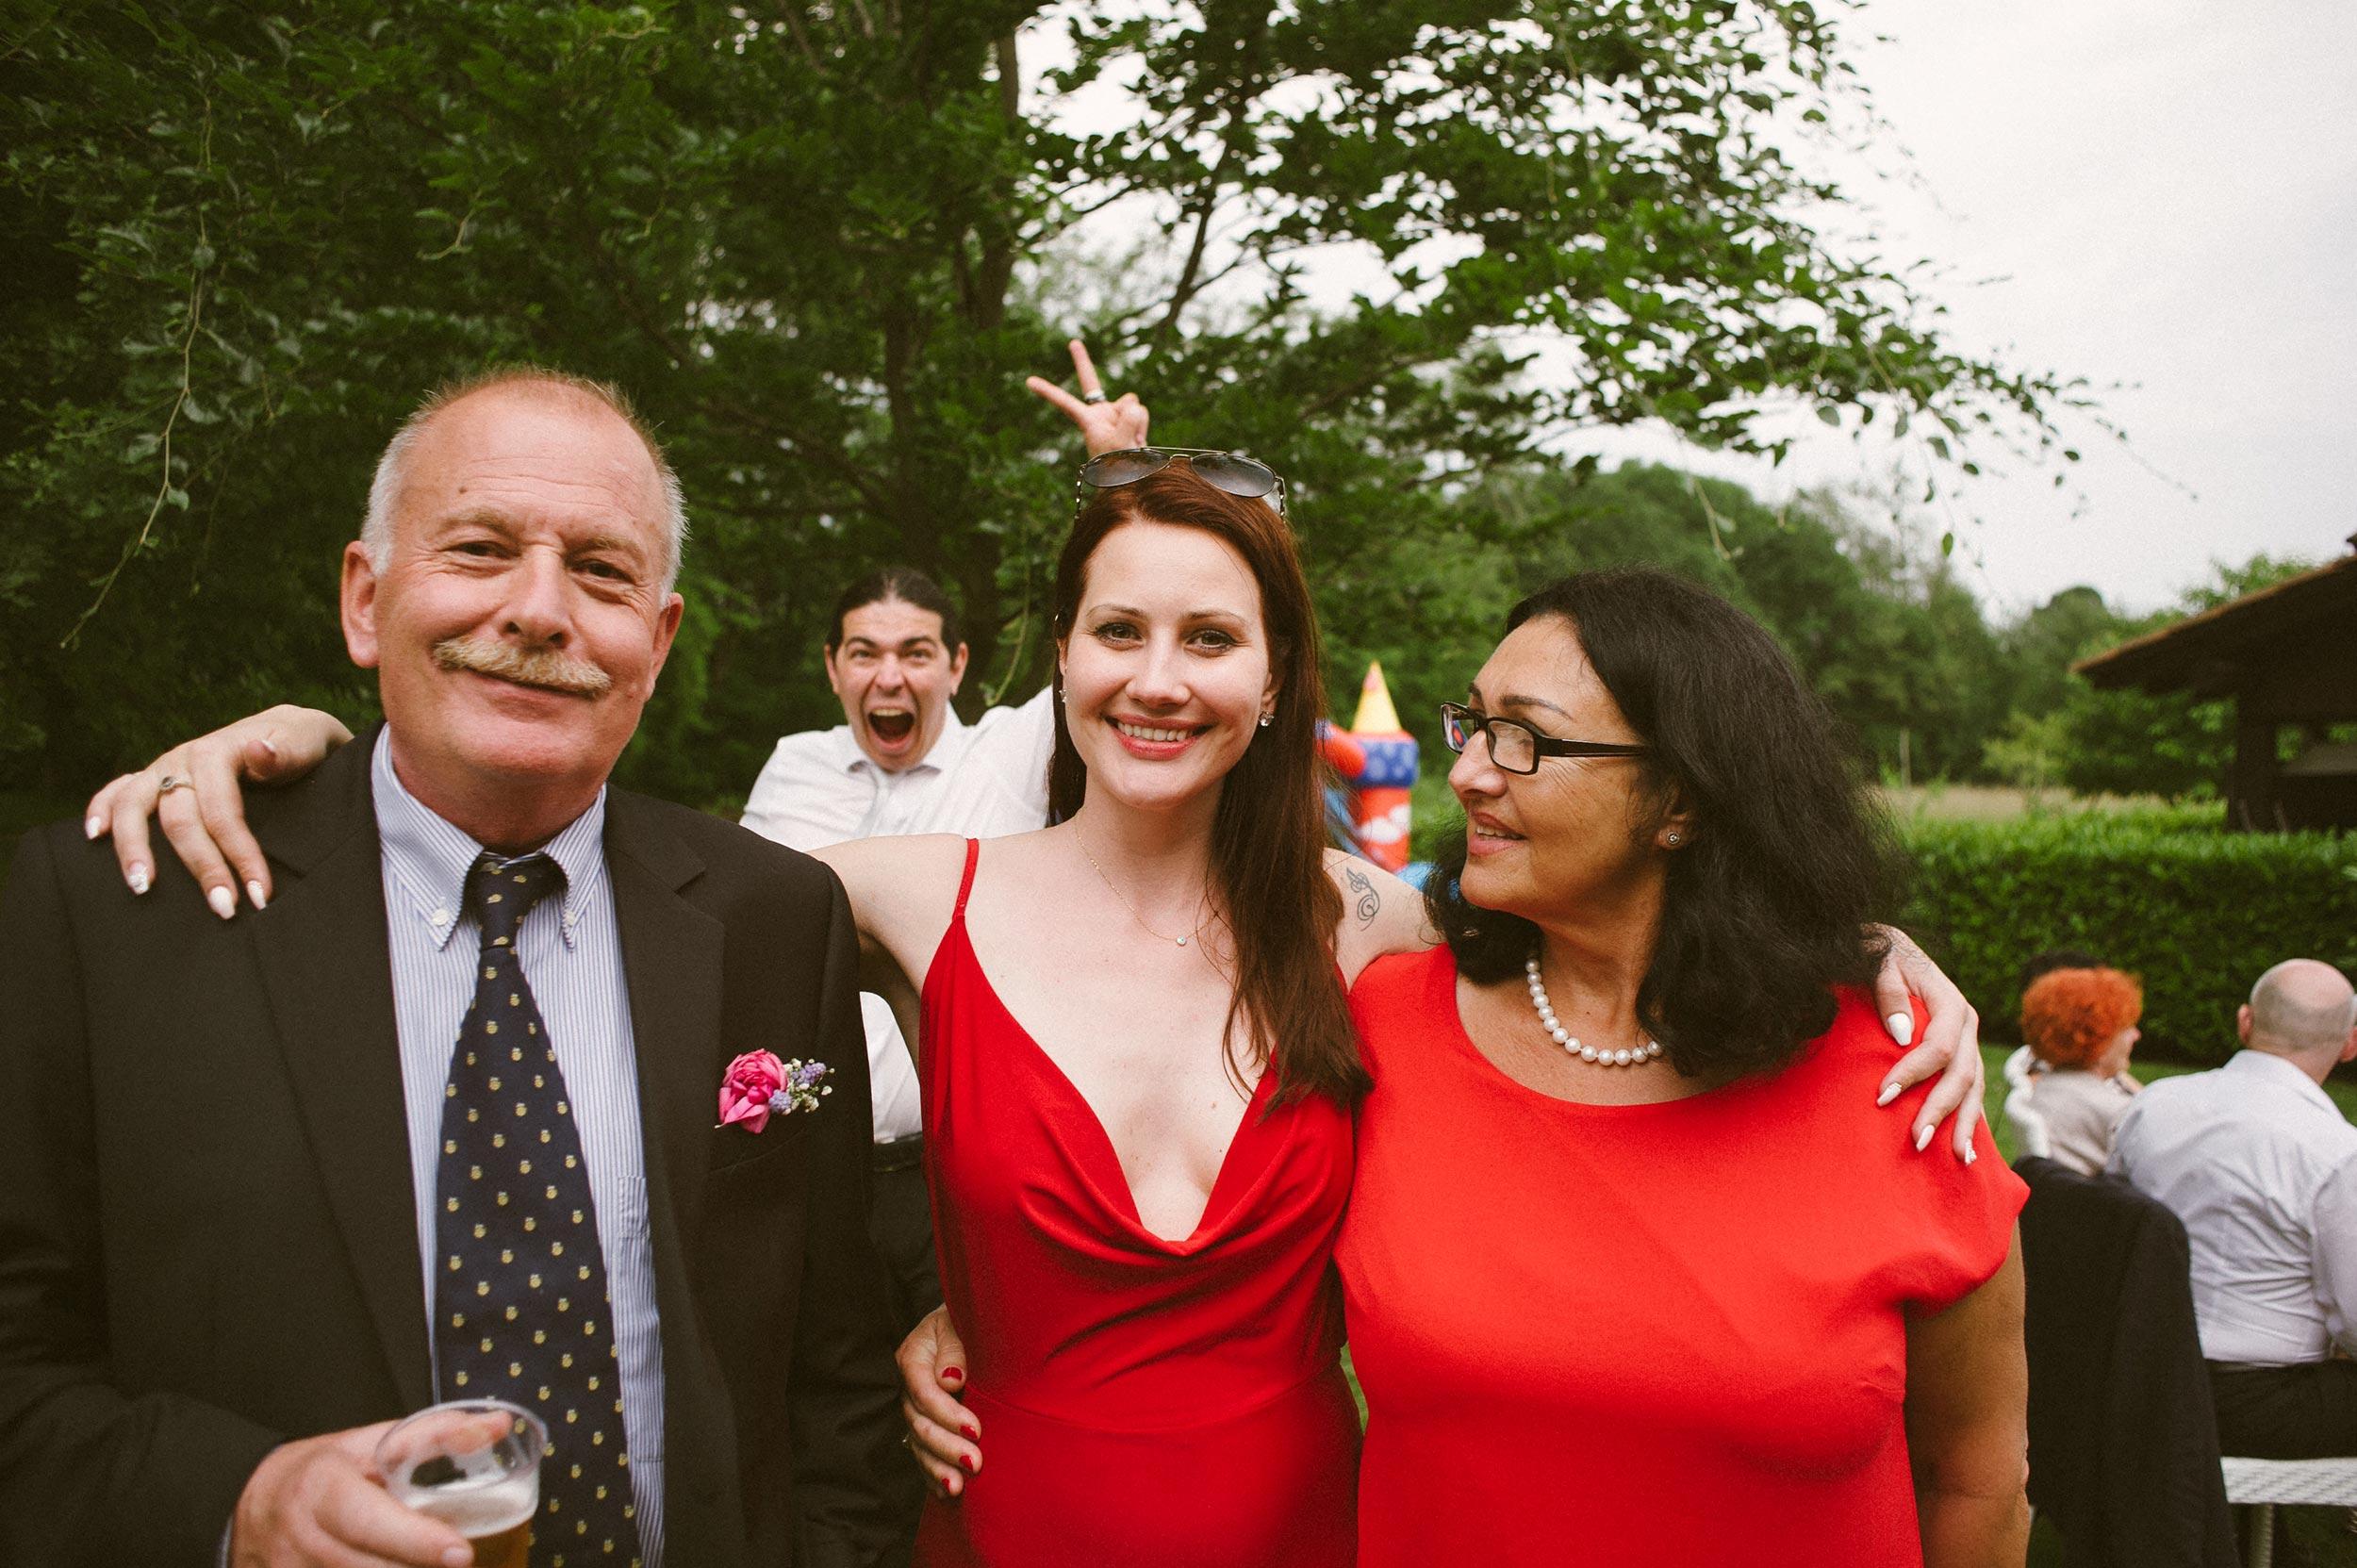 2016-Julius-Silke-Lake-Orta-Wedding-Photographer-Italy-Alessandro-Avenali-95.jpg